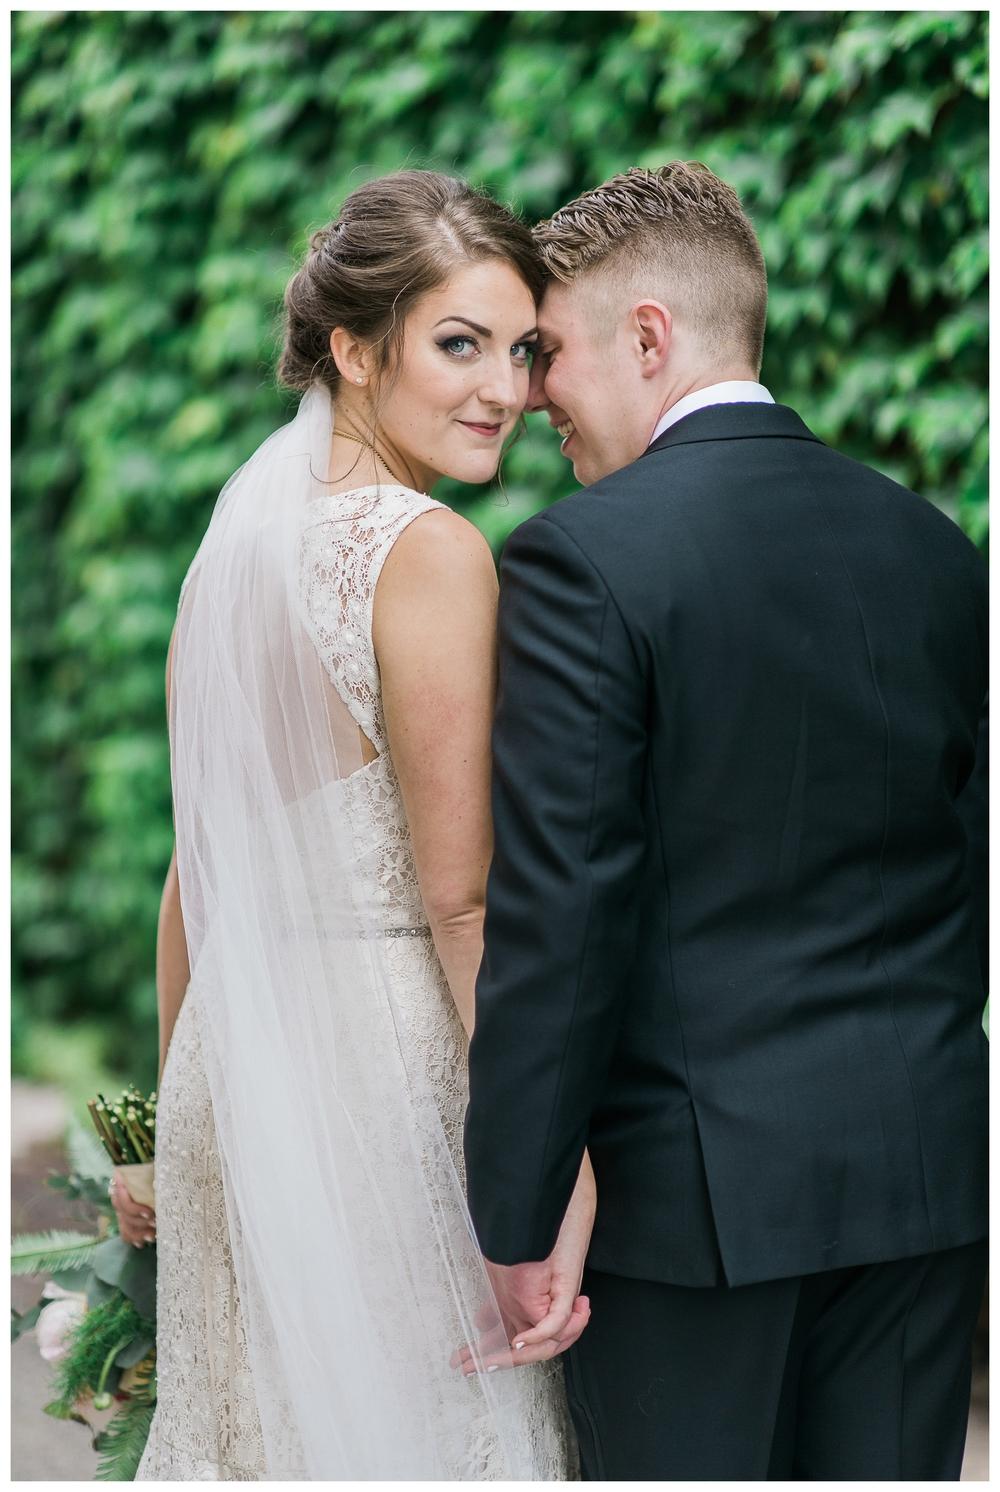 Rebecca_Bridges_Photography_Indianapolis_Wedding_Photographer_4386.jpg